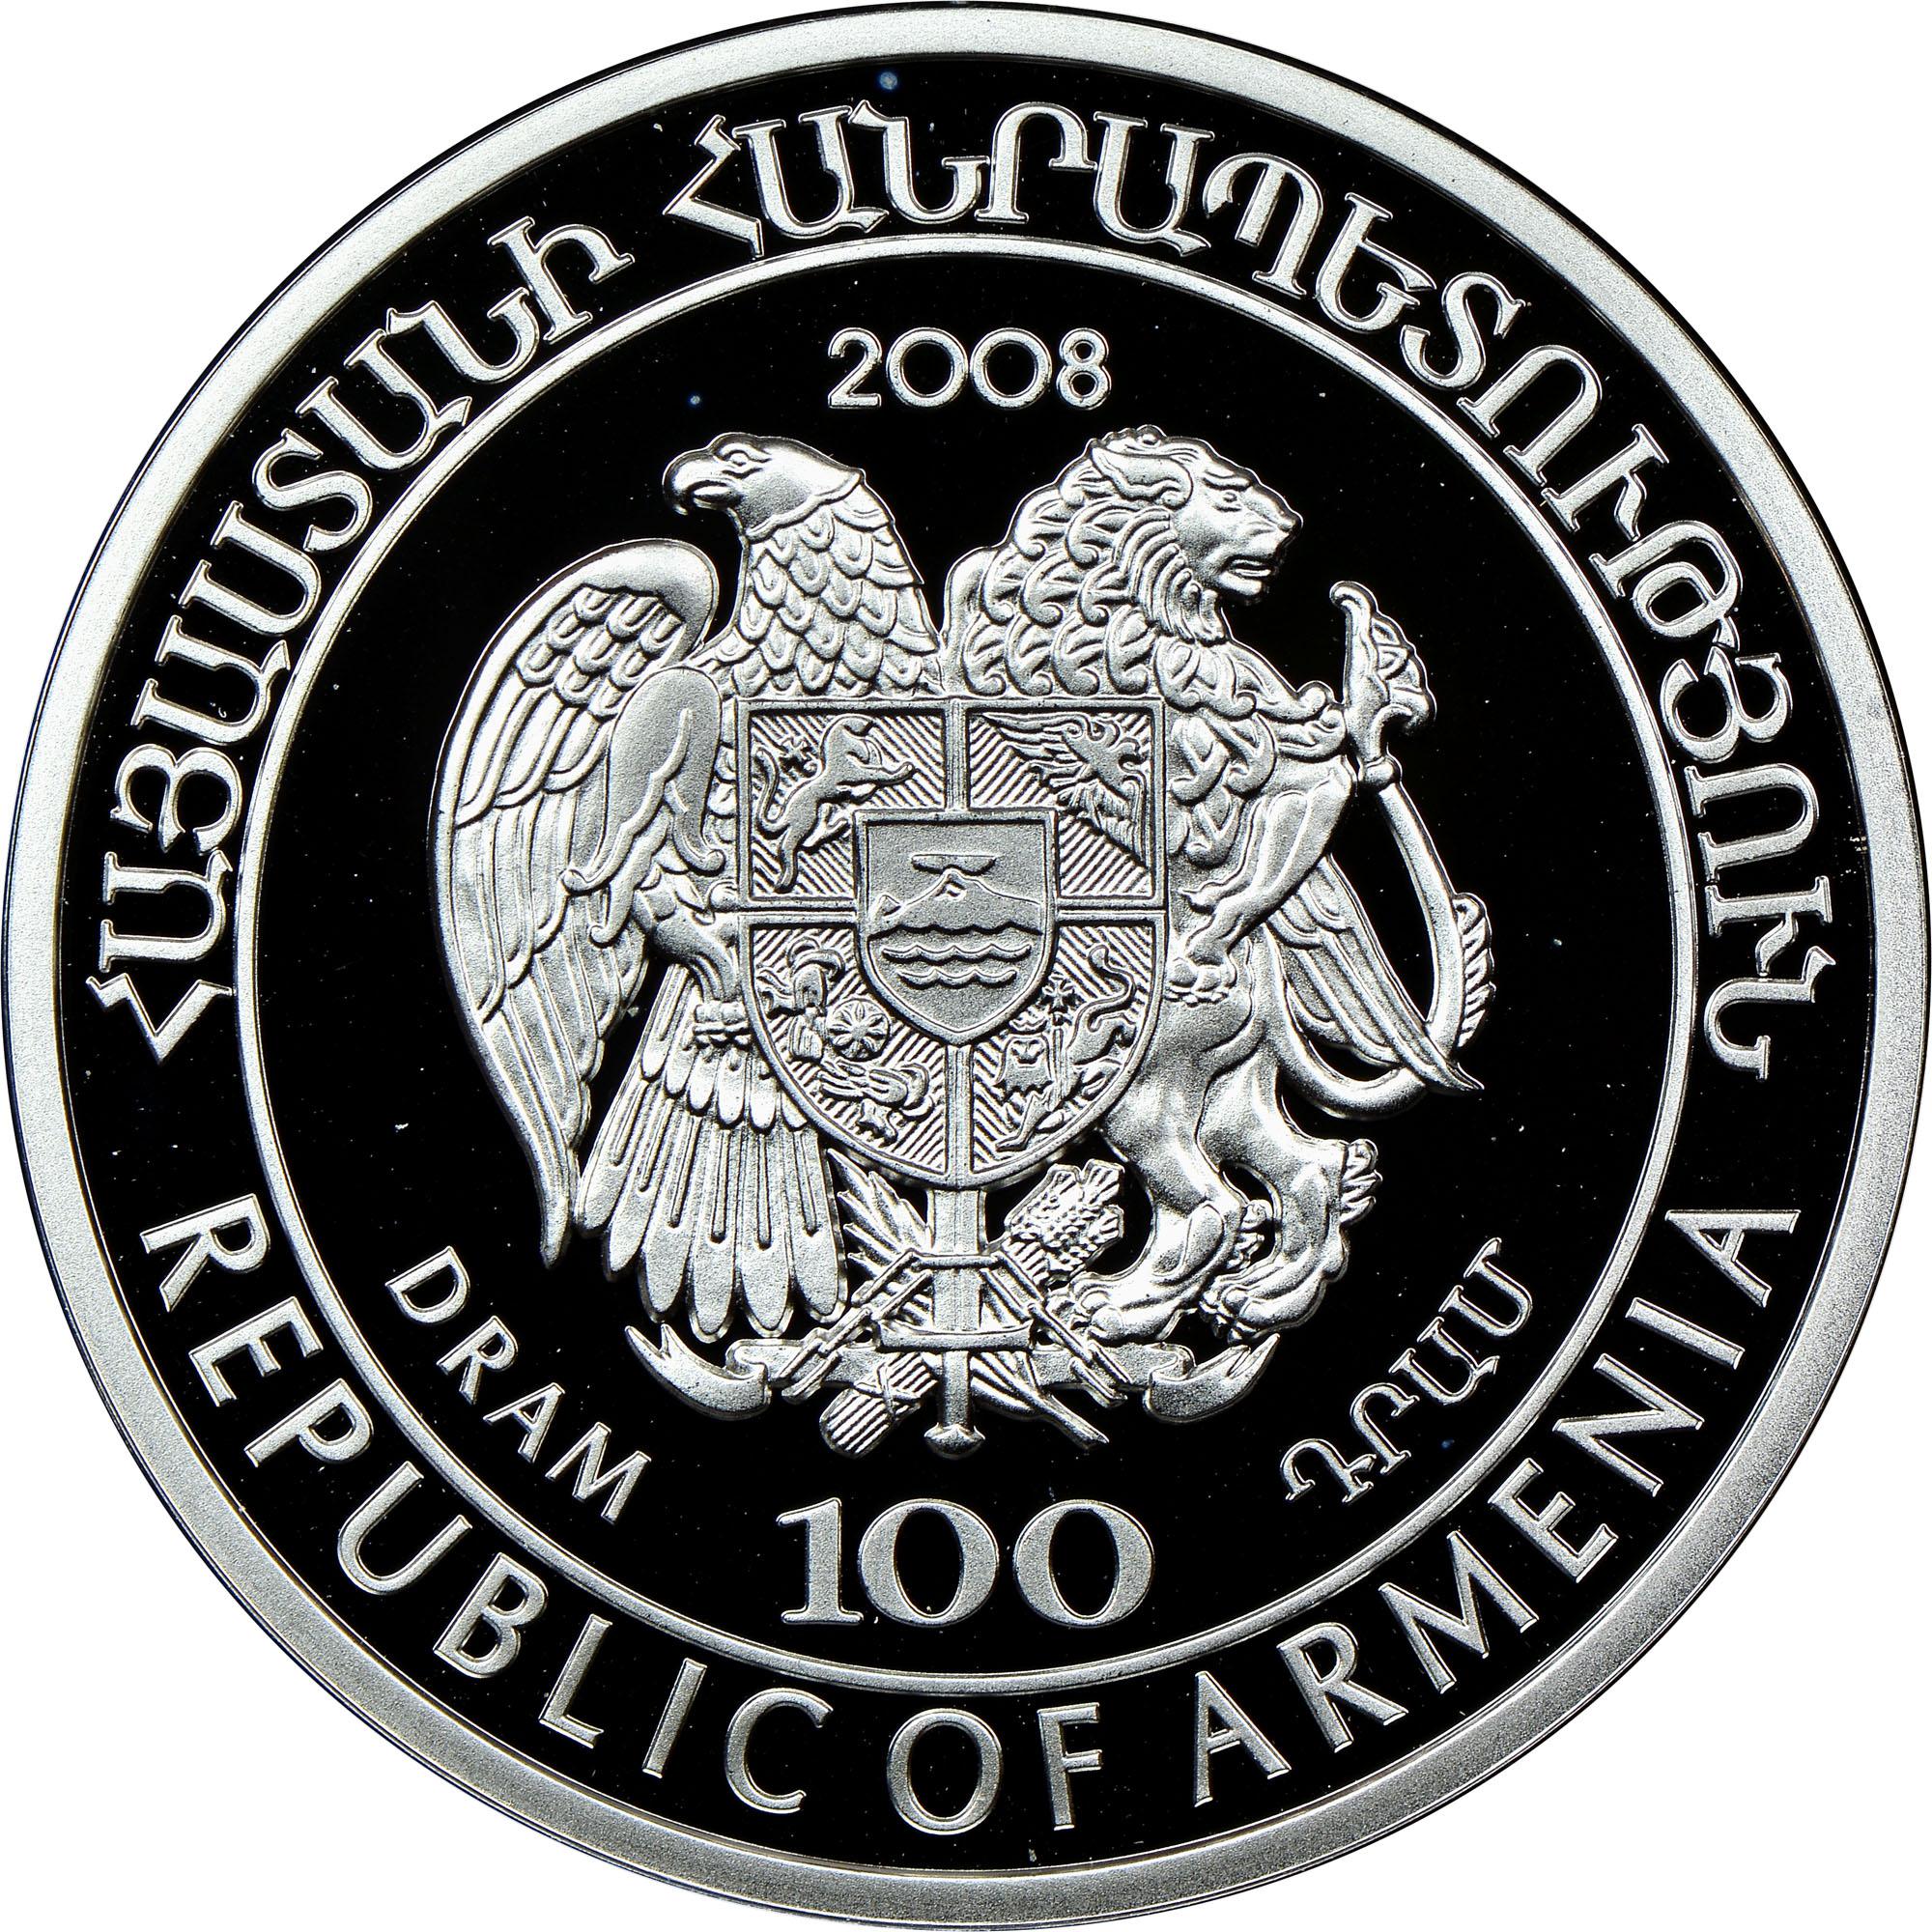 2008 Armenia 100 Dram obverse